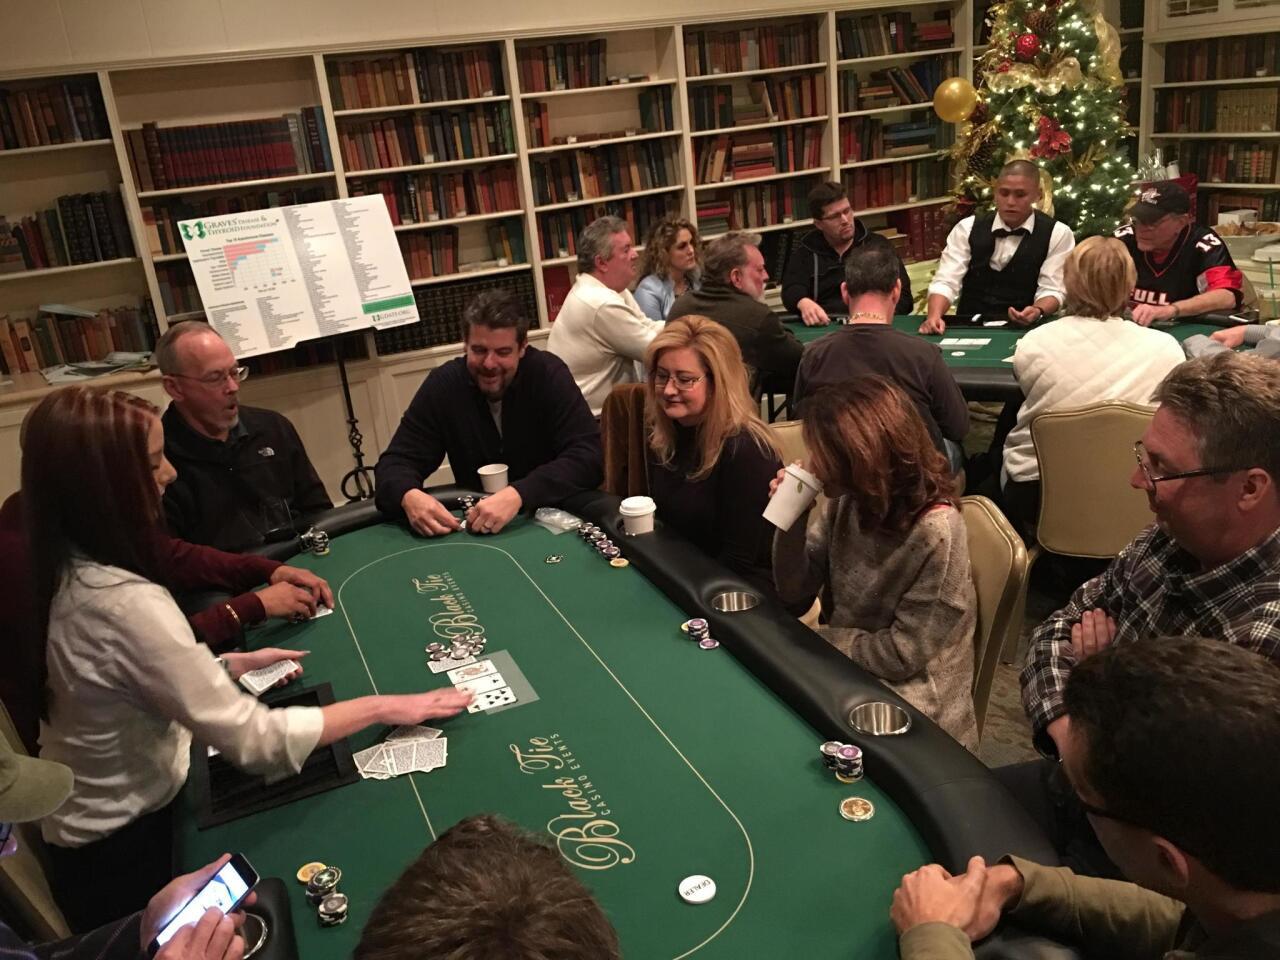 The Rancho Santa Fe Texas Hold'em Invitational Poker Tournament at The Inn at Rancho Santa Fe, benefiting the Graves' Disease and Thyroid Foundation.